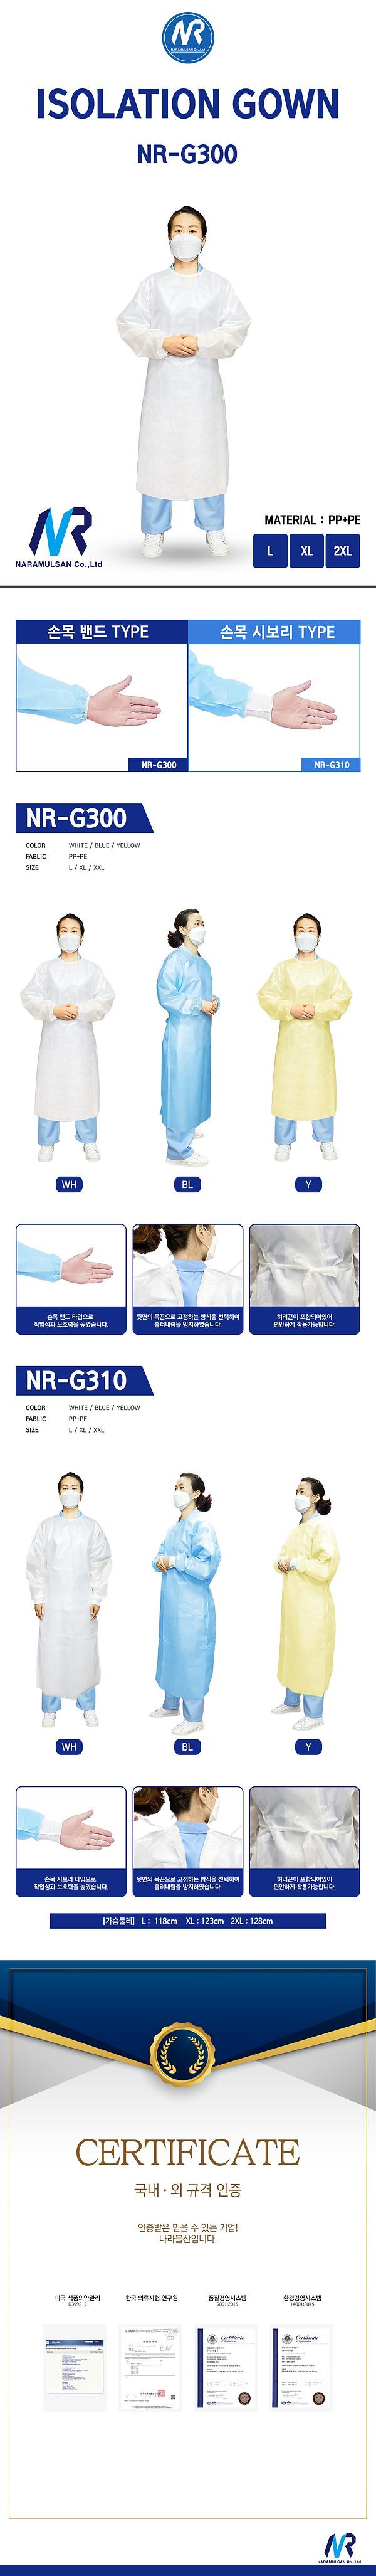 NR-G300(인증마크없음).jpg